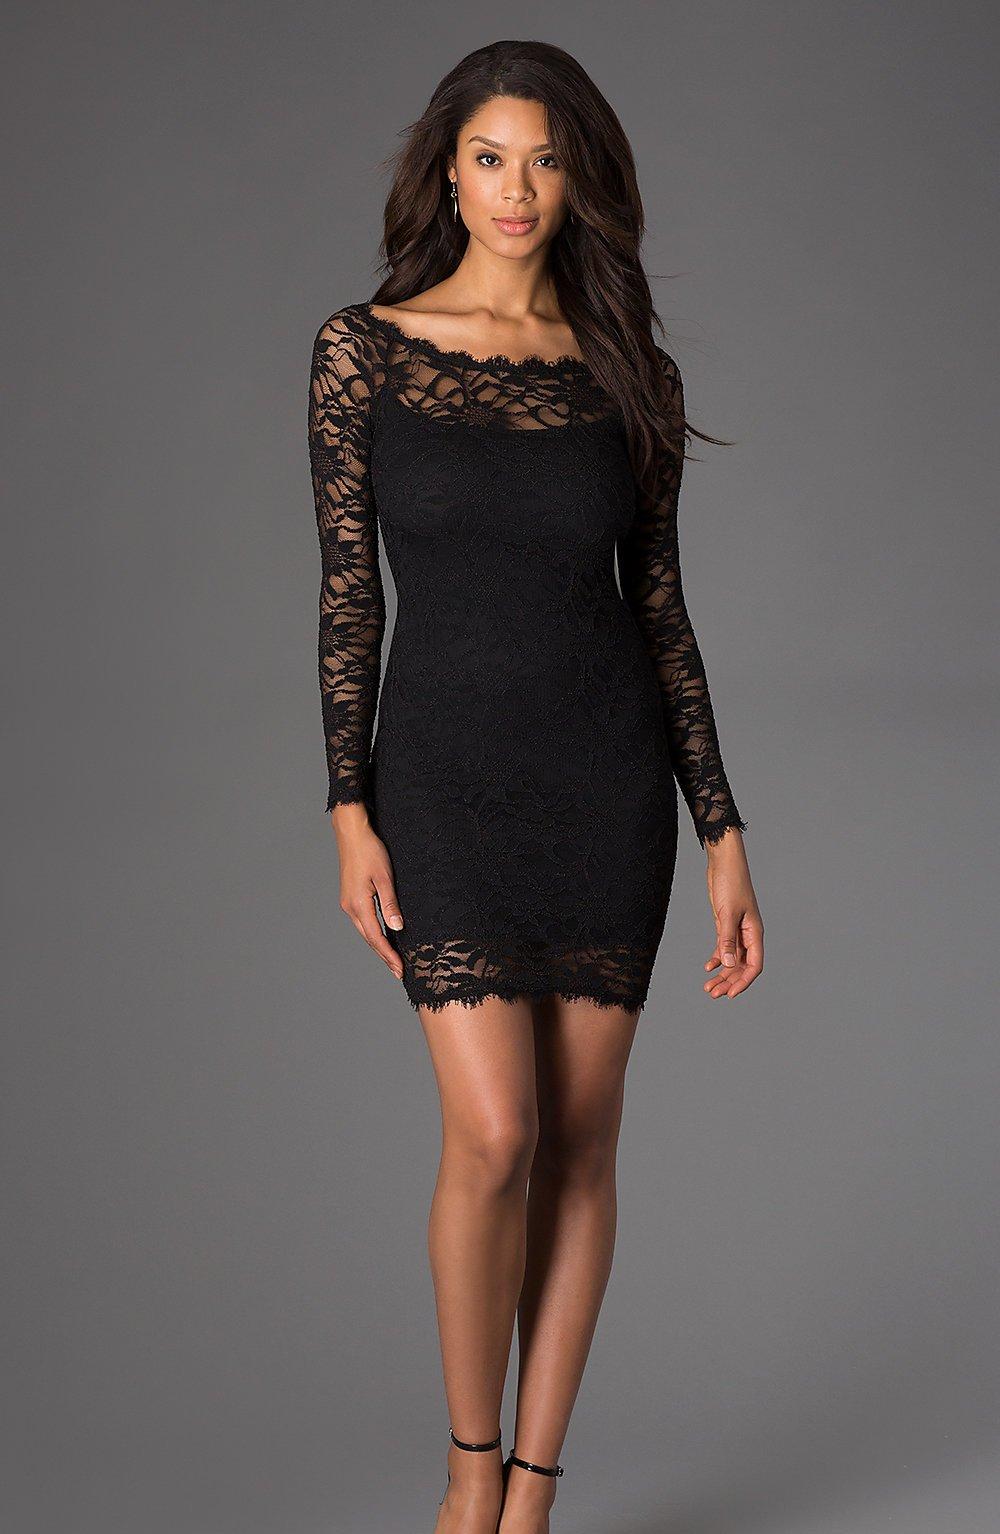 Short Sexy Black Dresses